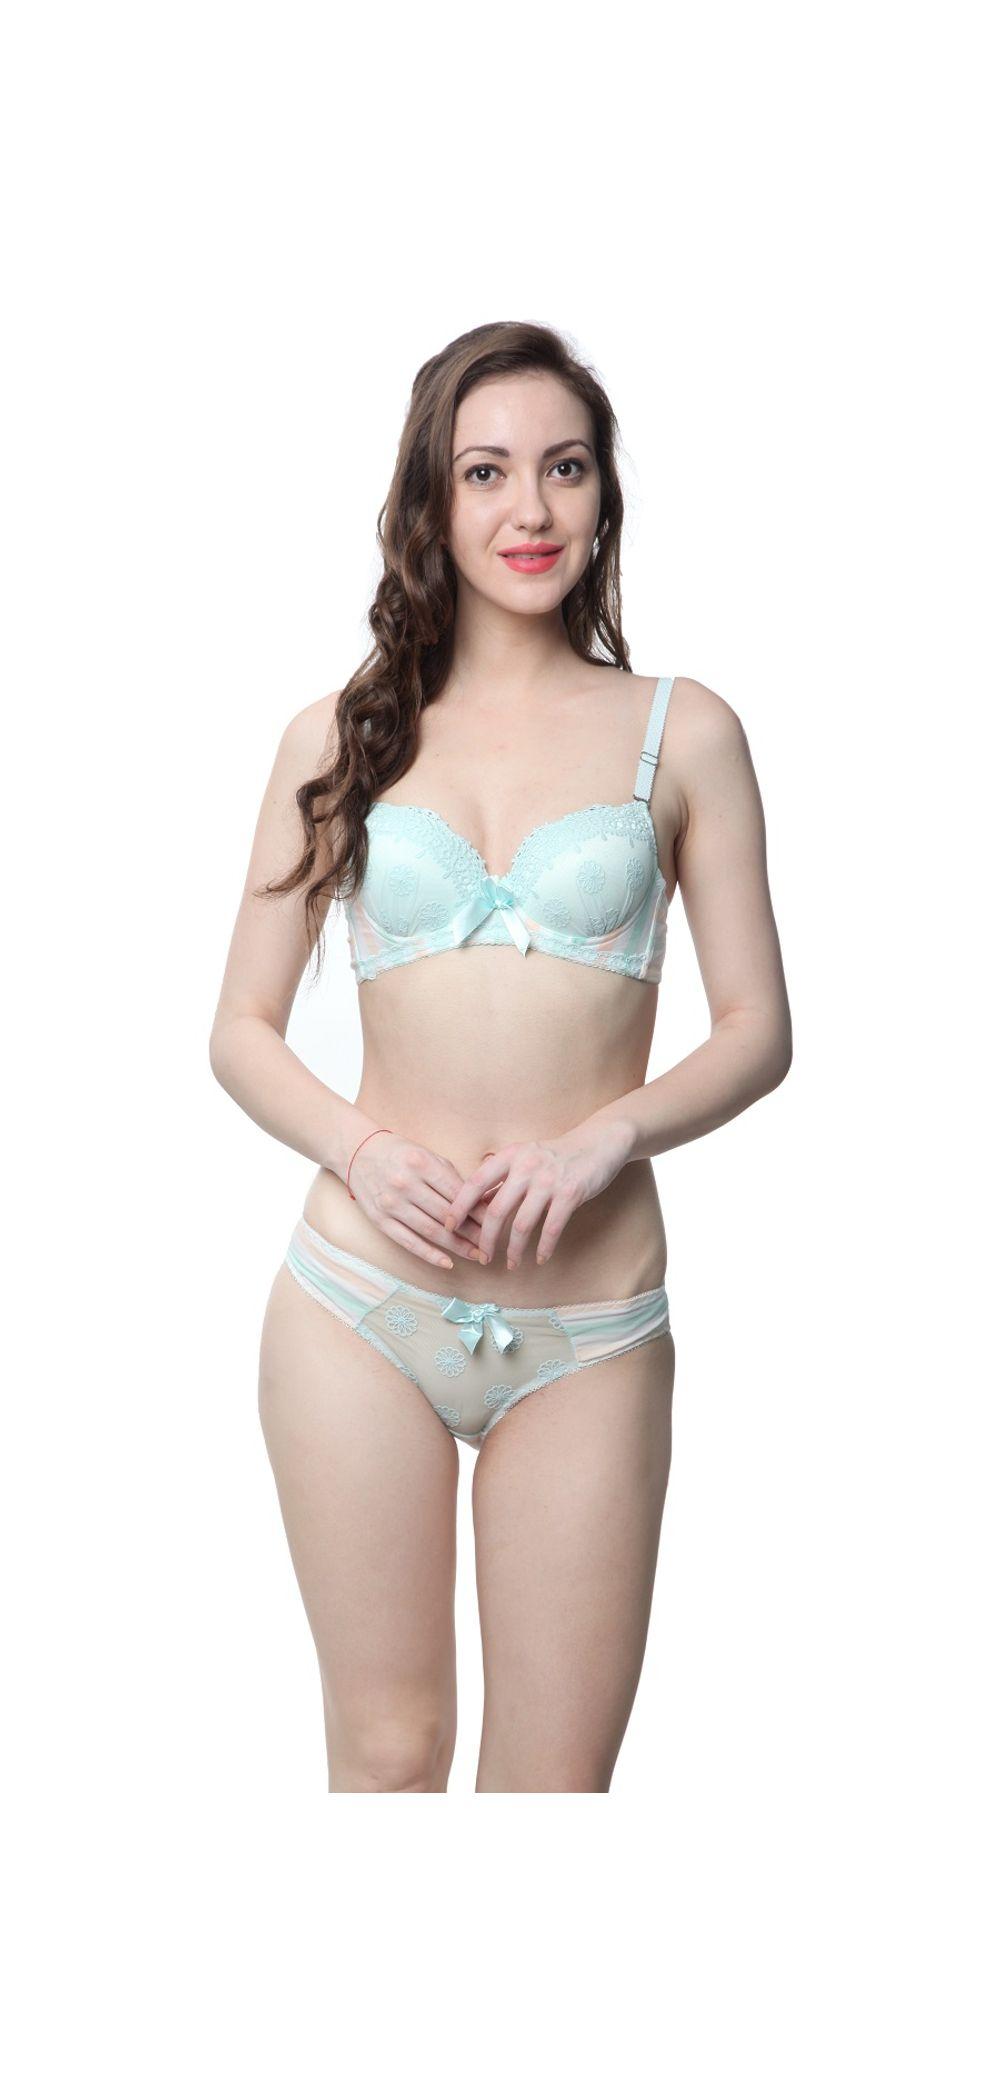 712d164ba Glus Lady Victoria Net Laced Push Up Underwire Bra And Bikini Set ...